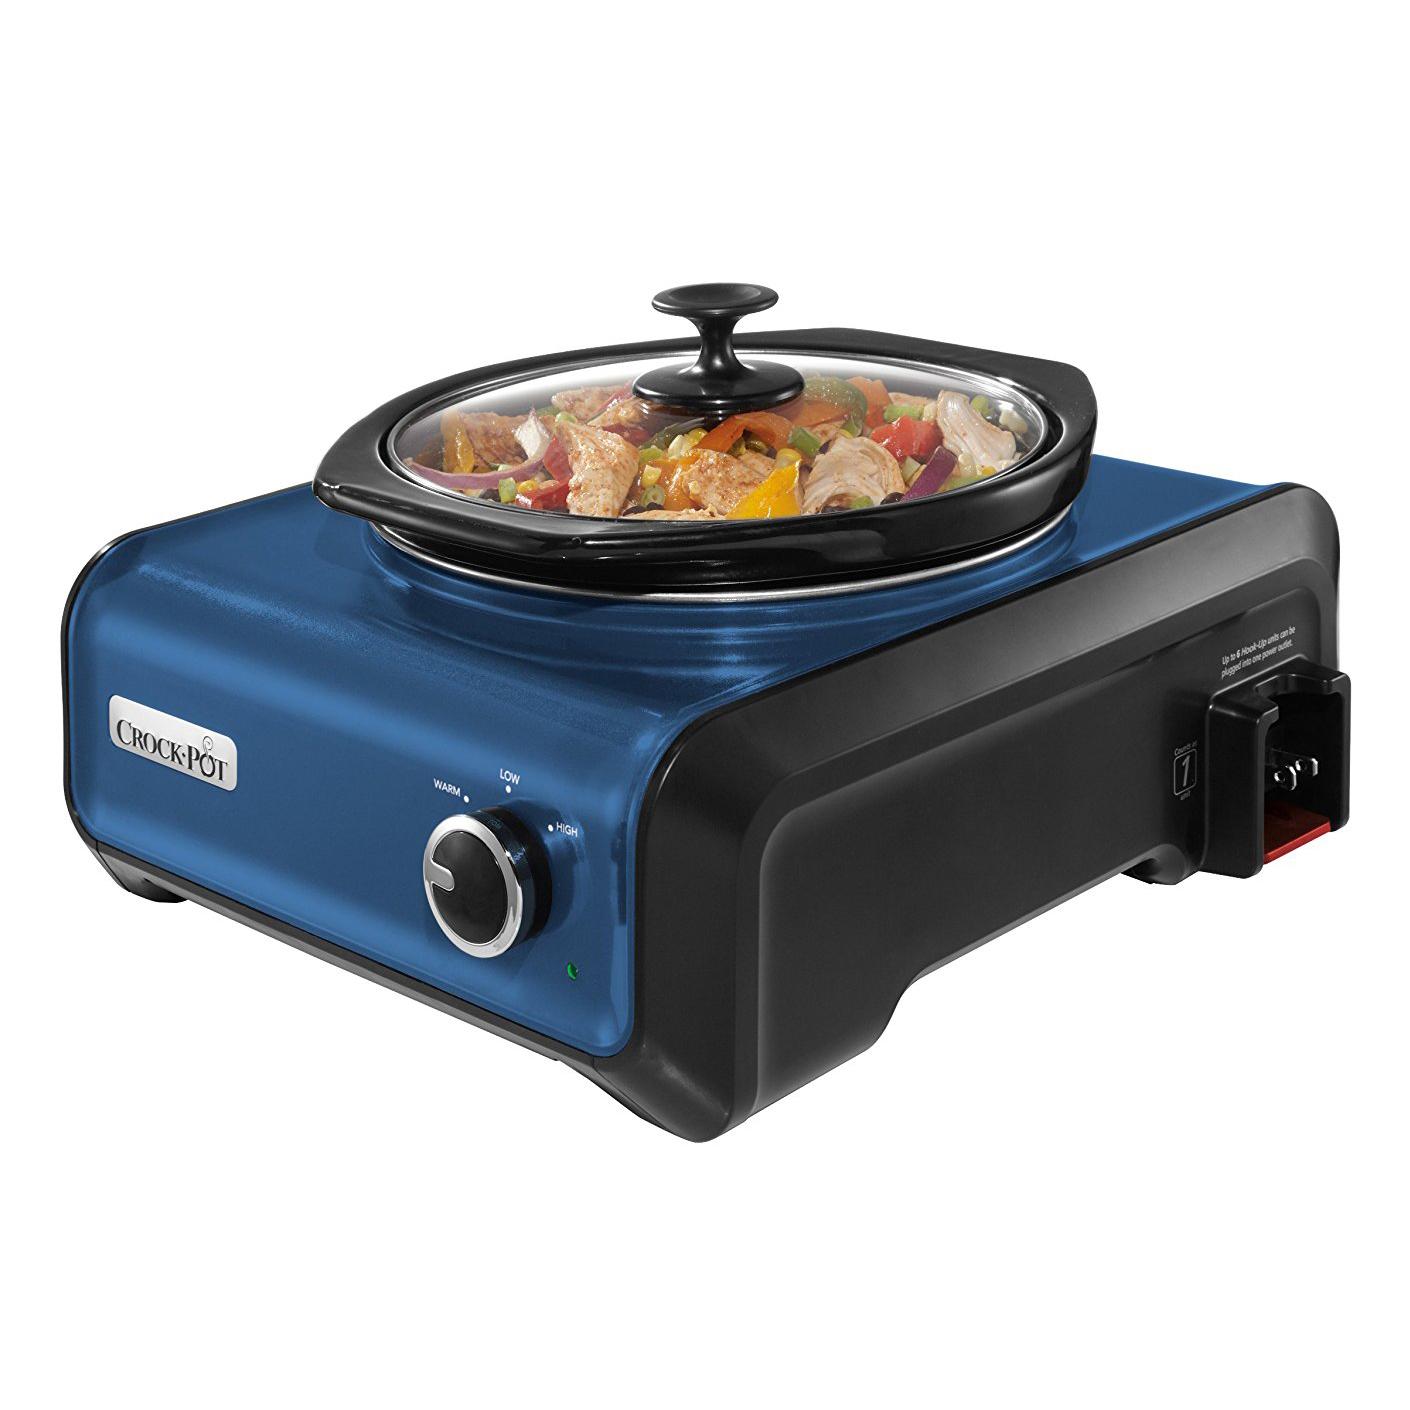 Crock-Pot Hook Up 2-Quart Connectable Entertaining Slow Cooker System, Blue